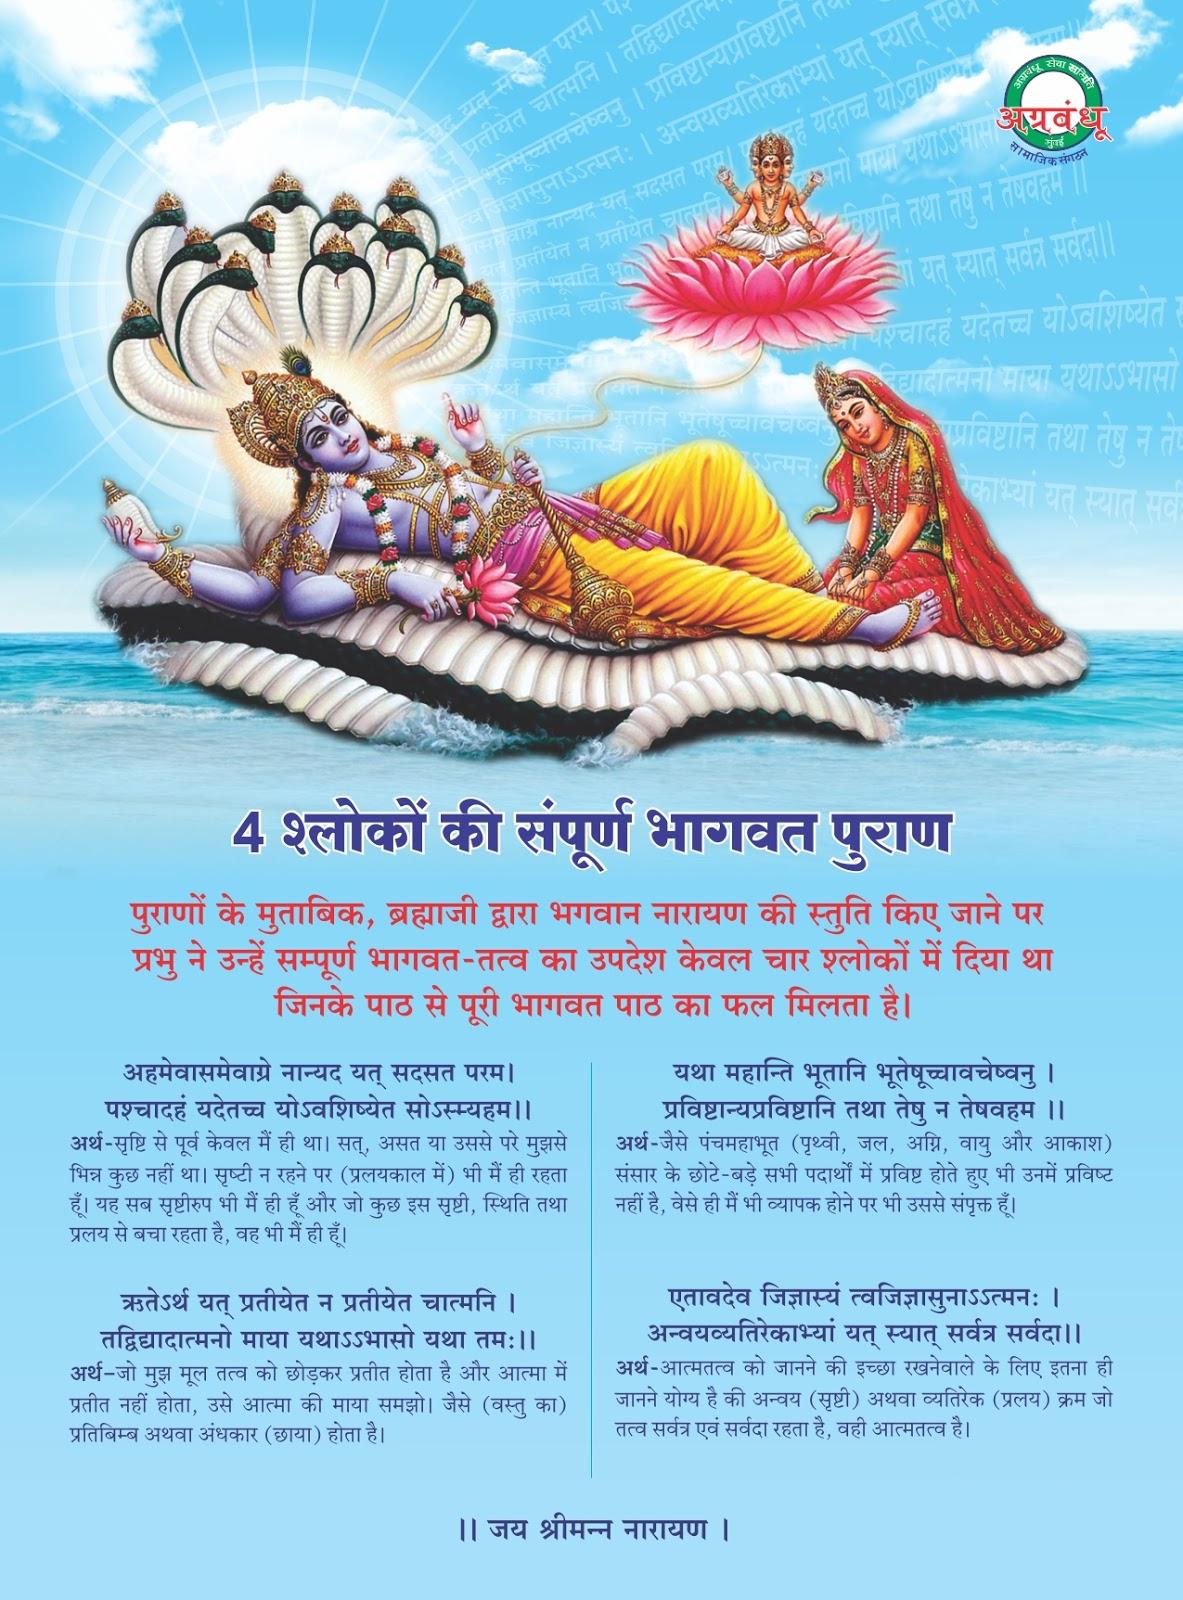 Bhagwat katha invitation card stopboris Gallery